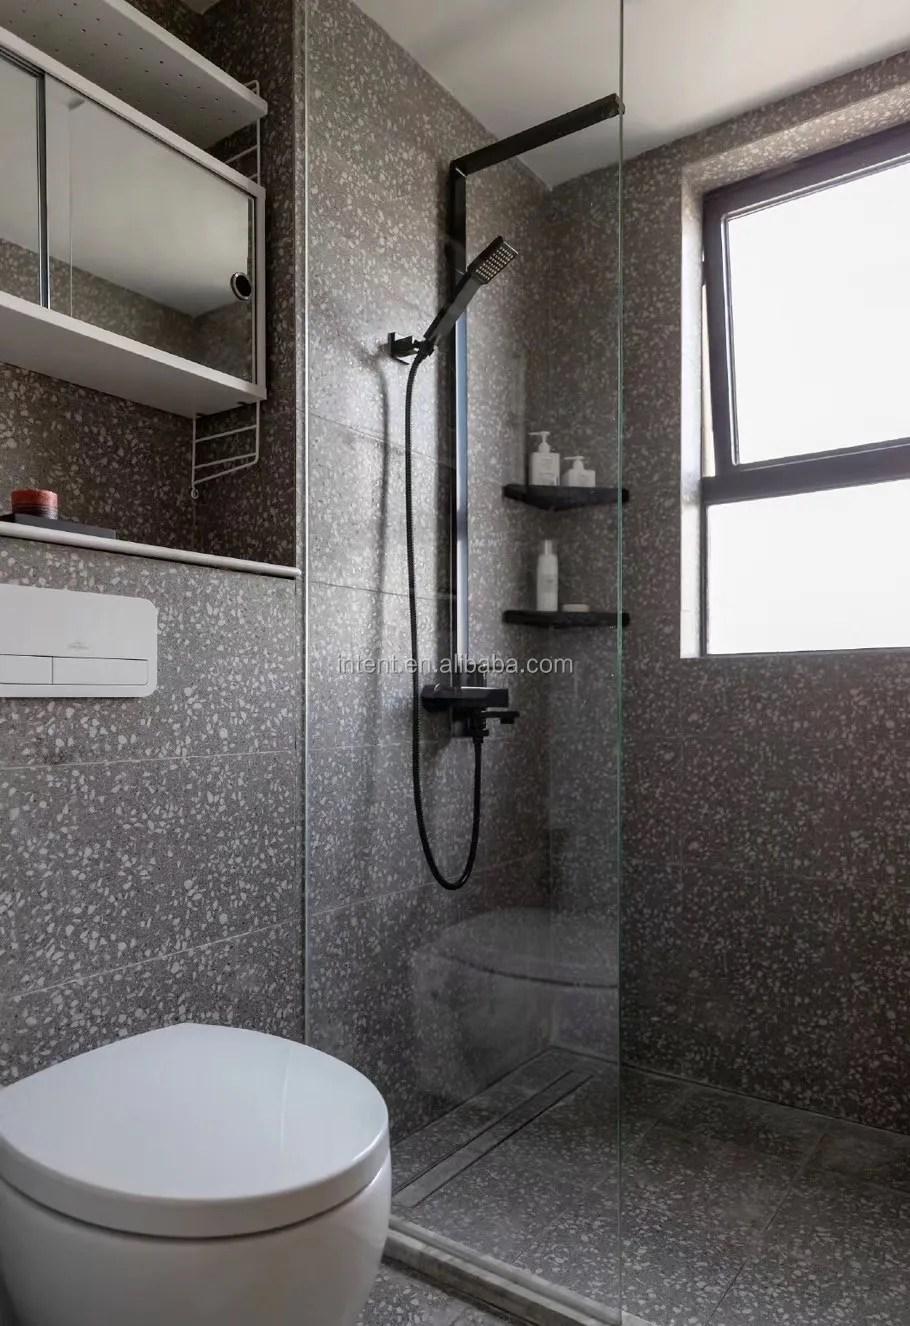 high quality grey terrazzo slabs tile for bathroom buy cheap terrazzo tile terrazzo tiles for bathrooms terrazzo floor tiles product on alibaba com